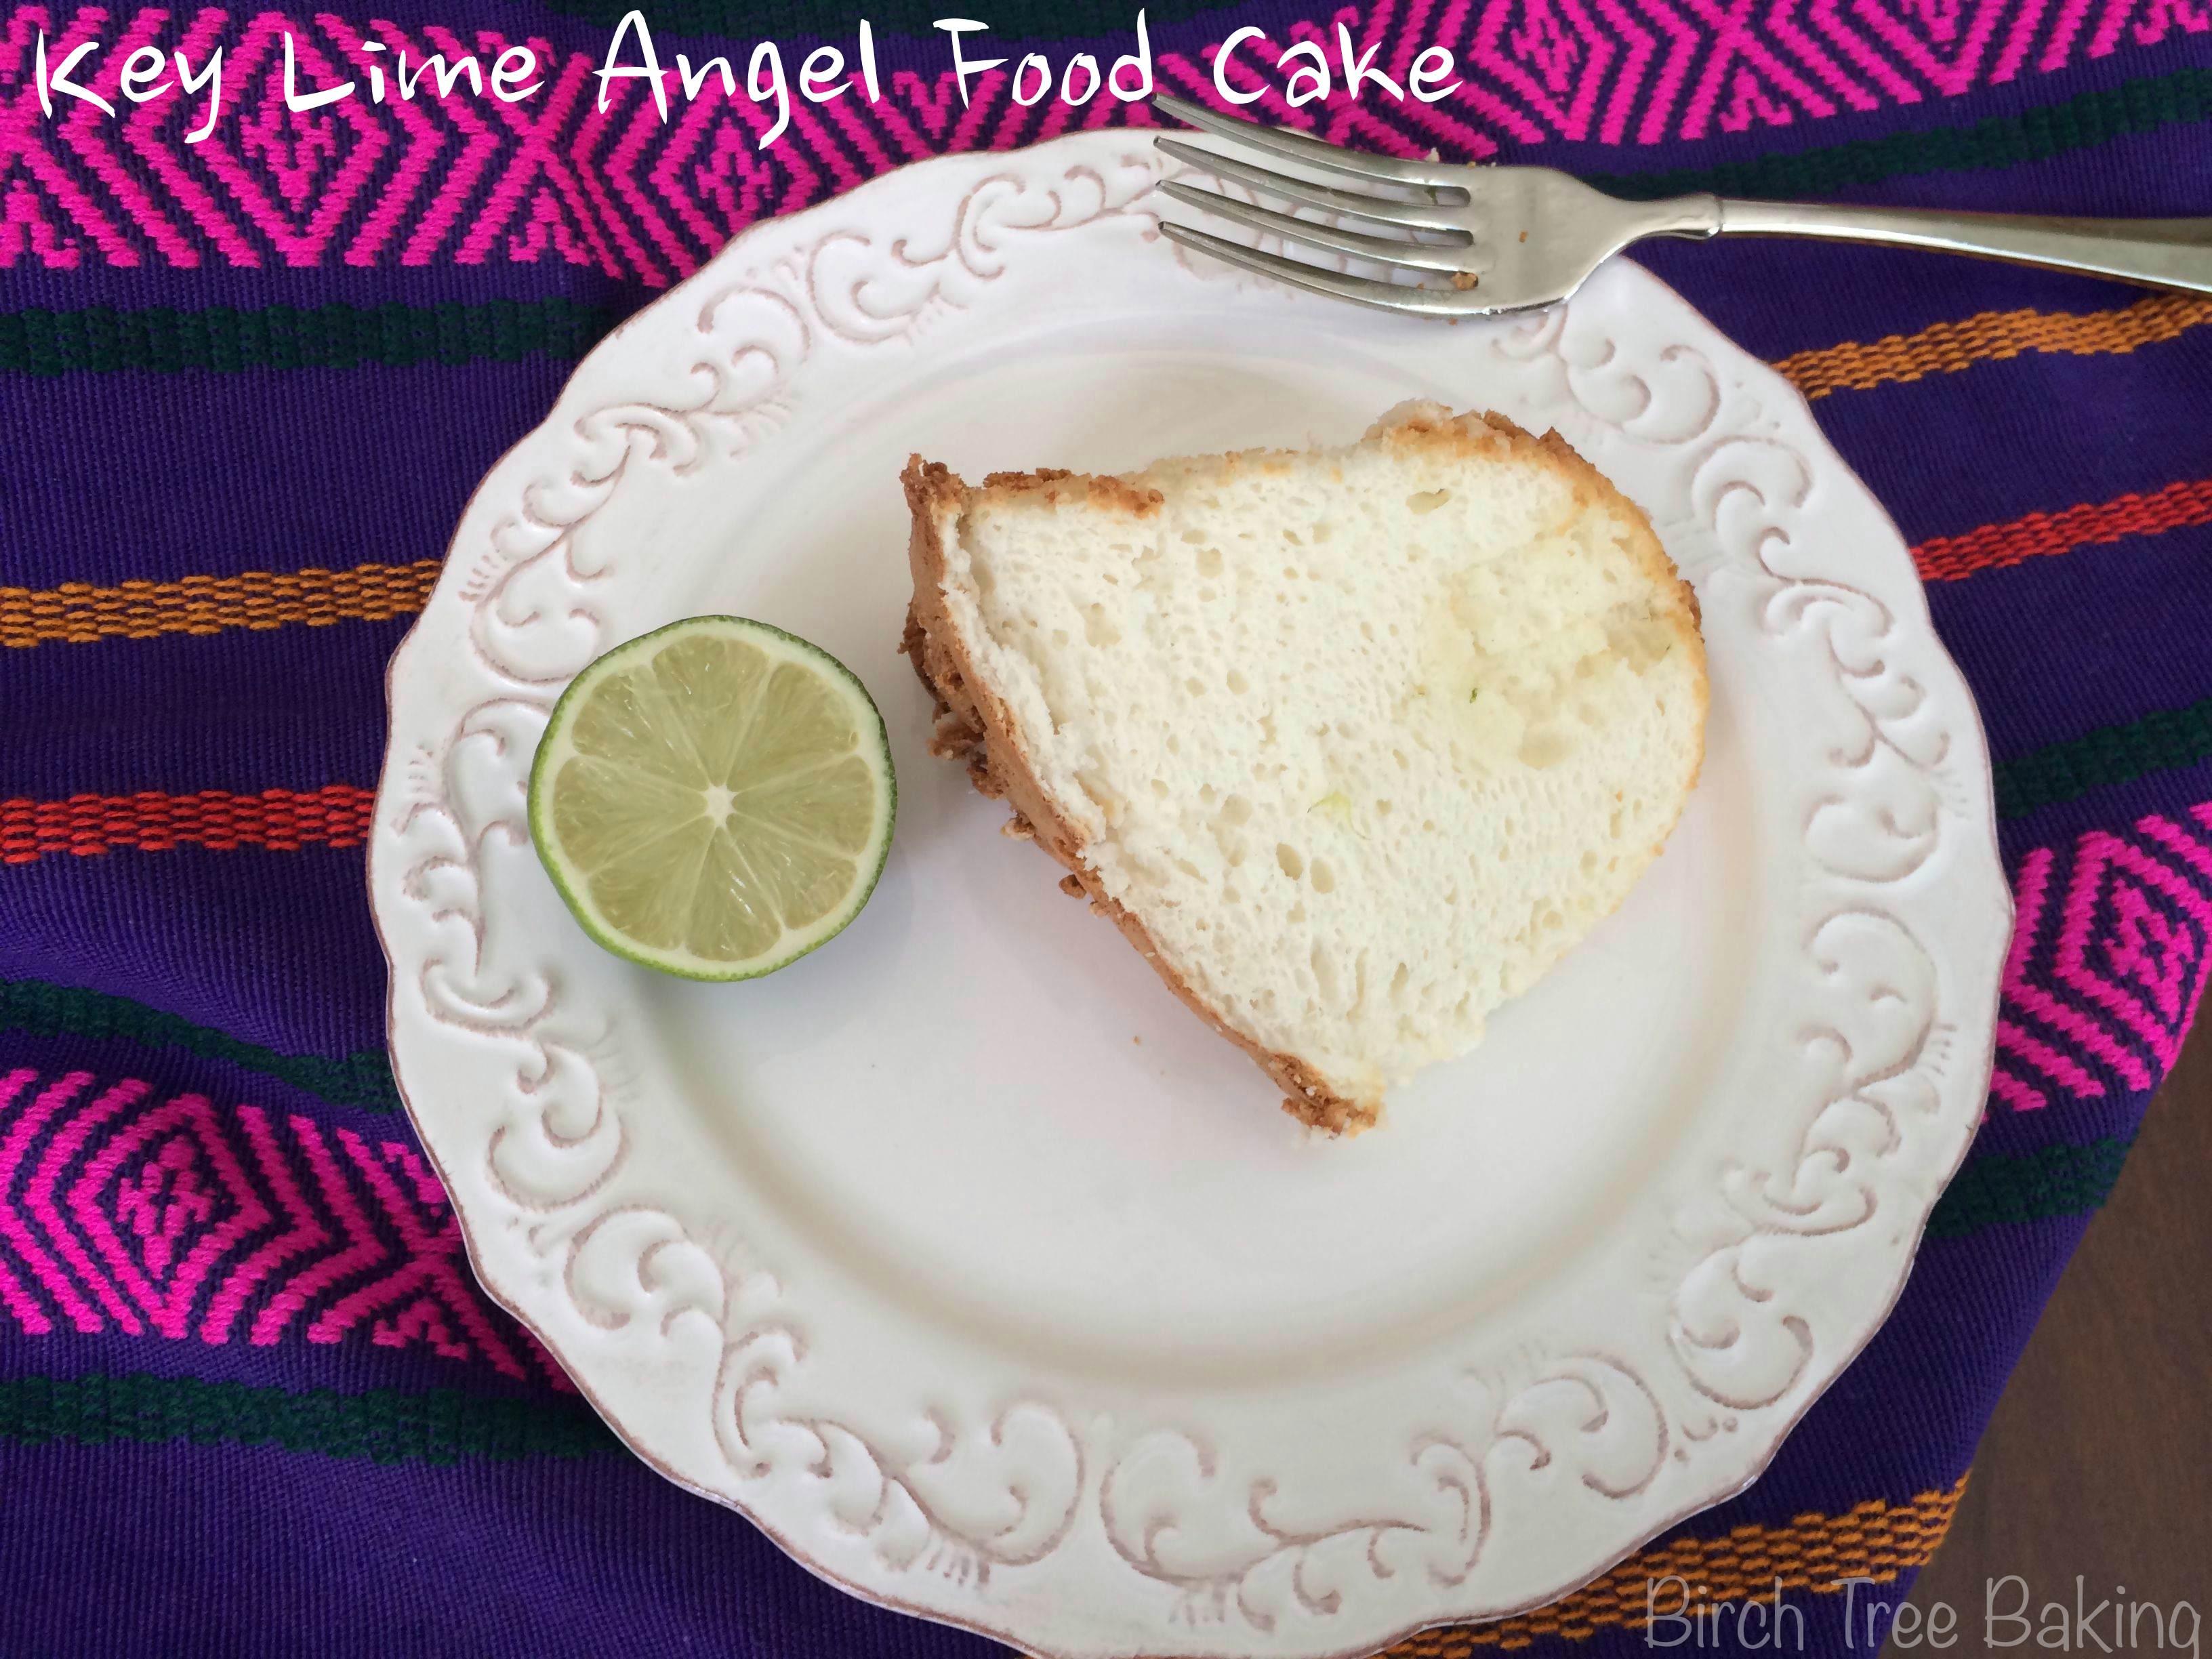 Key Lime Angel Food Cake Birch Tree Baking